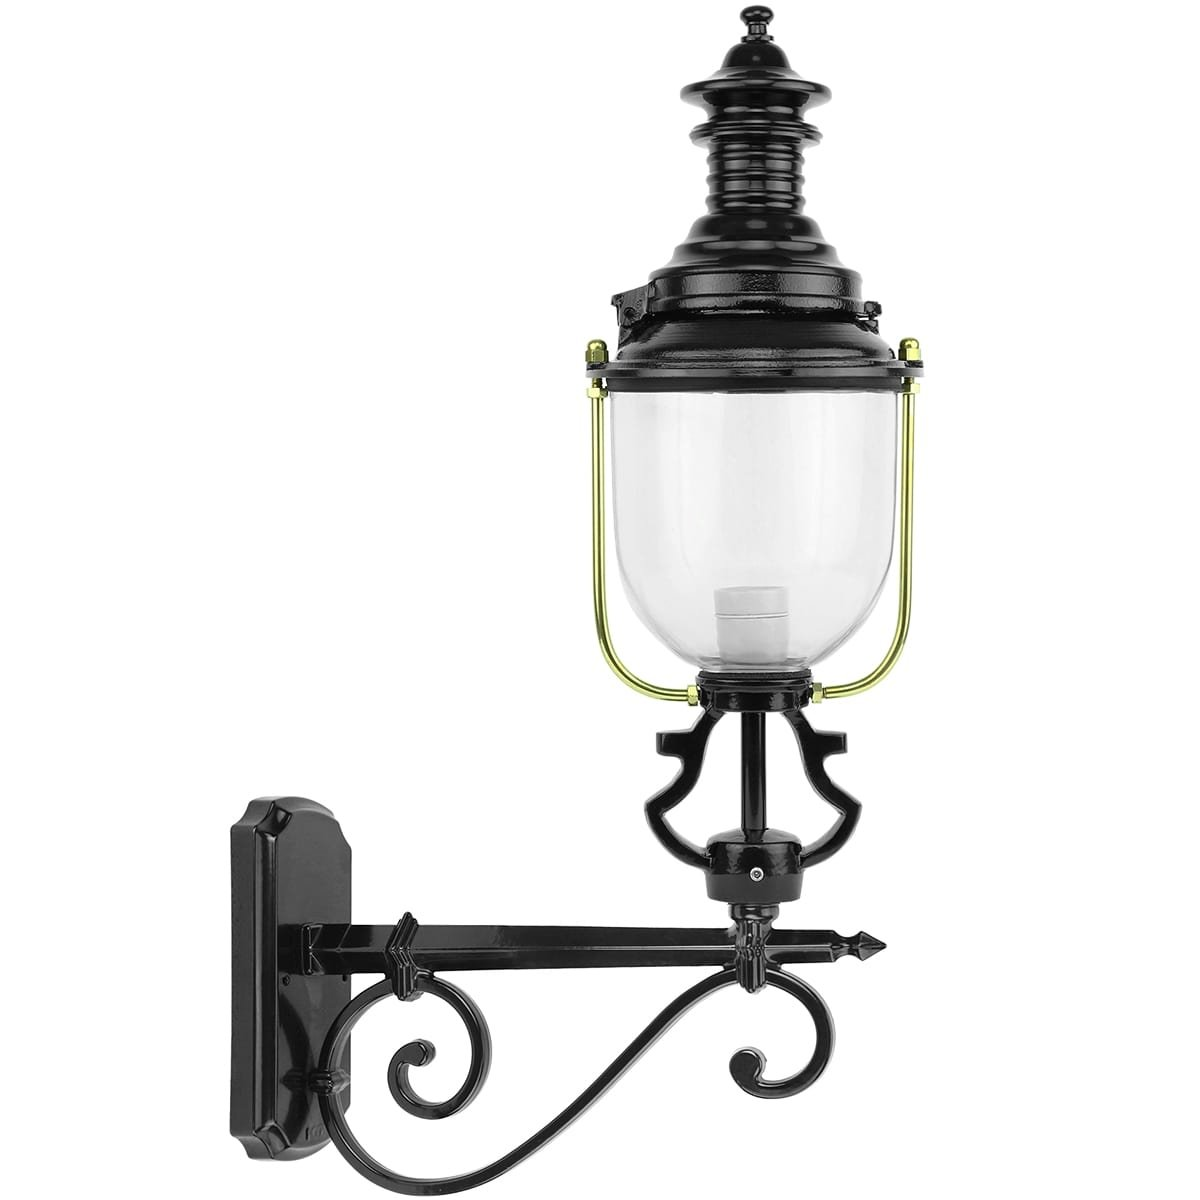 Outdoor Lighting Classic Rural Wall lantern round Arensgenhout - 75 cm